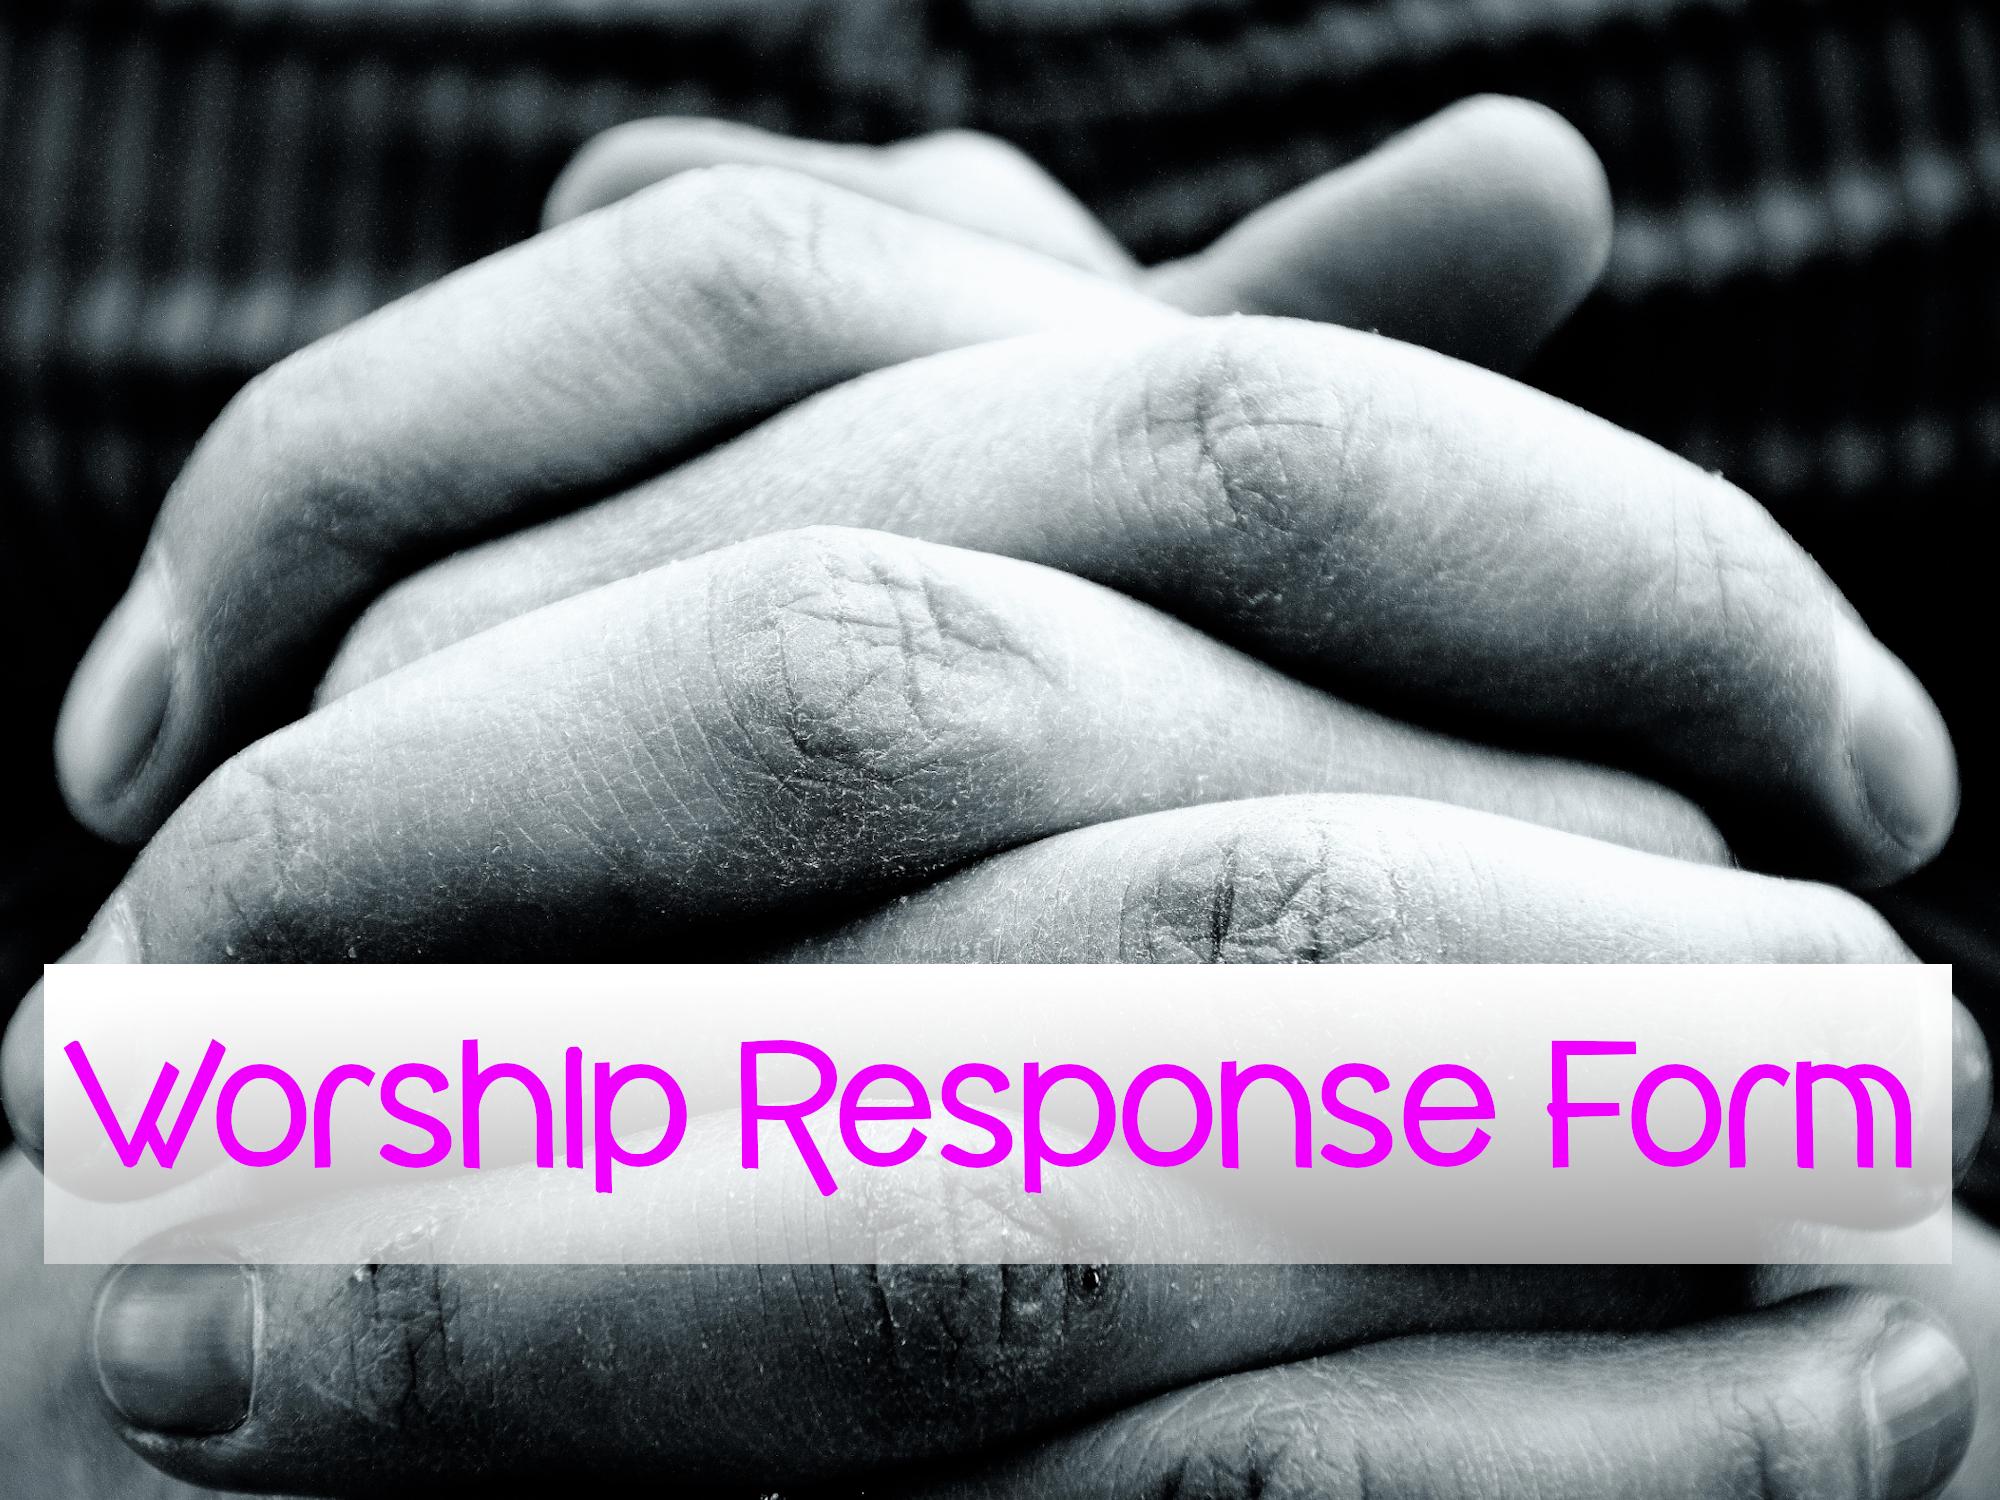 Worship Response Form [link]